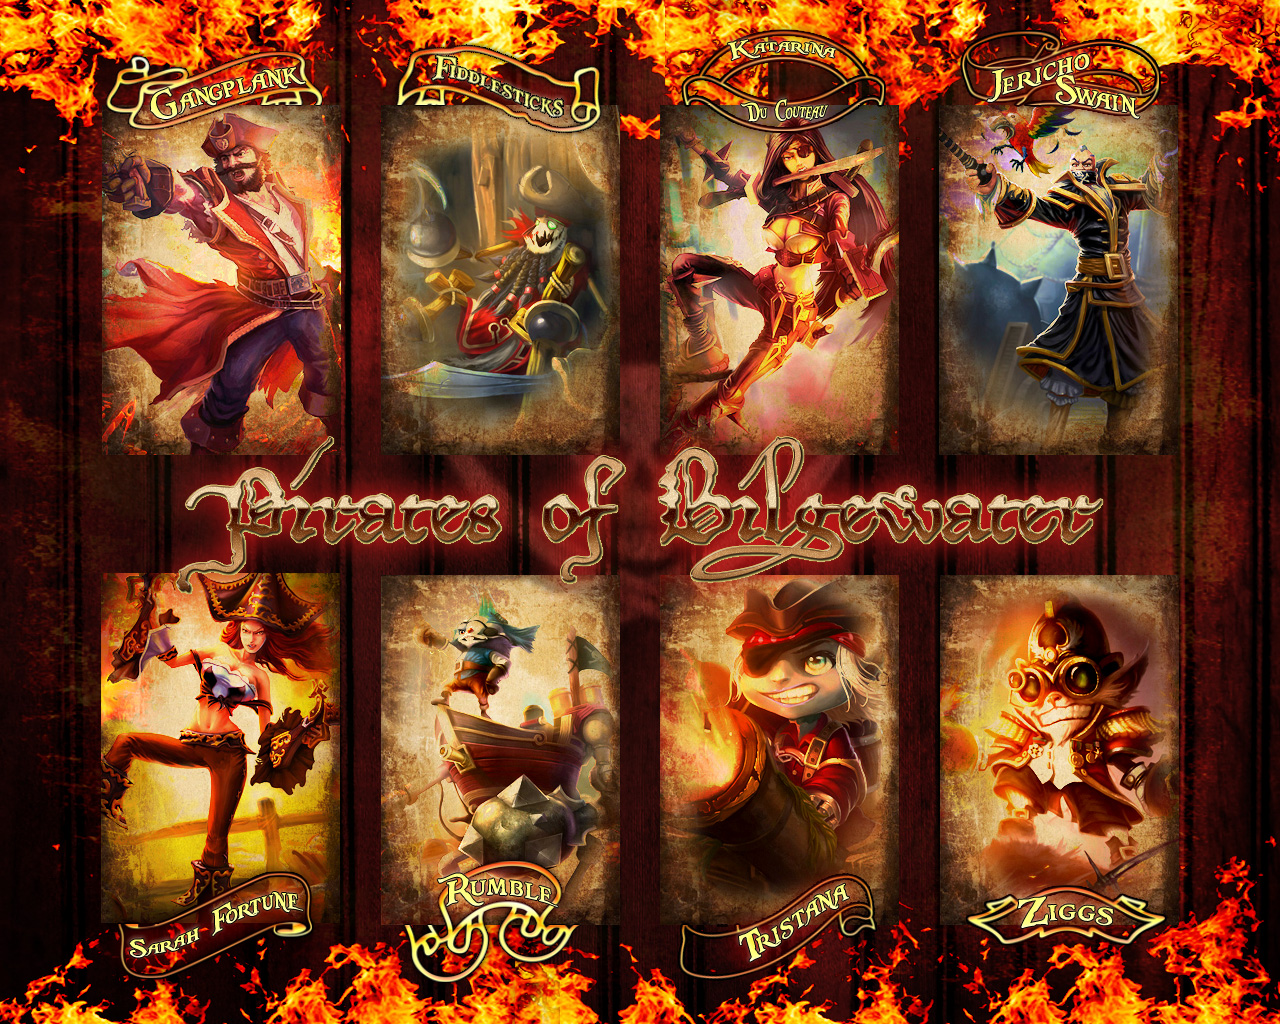 Pirates of Bilgewater Wallpaper by PaoloPuzza on DeviantArt